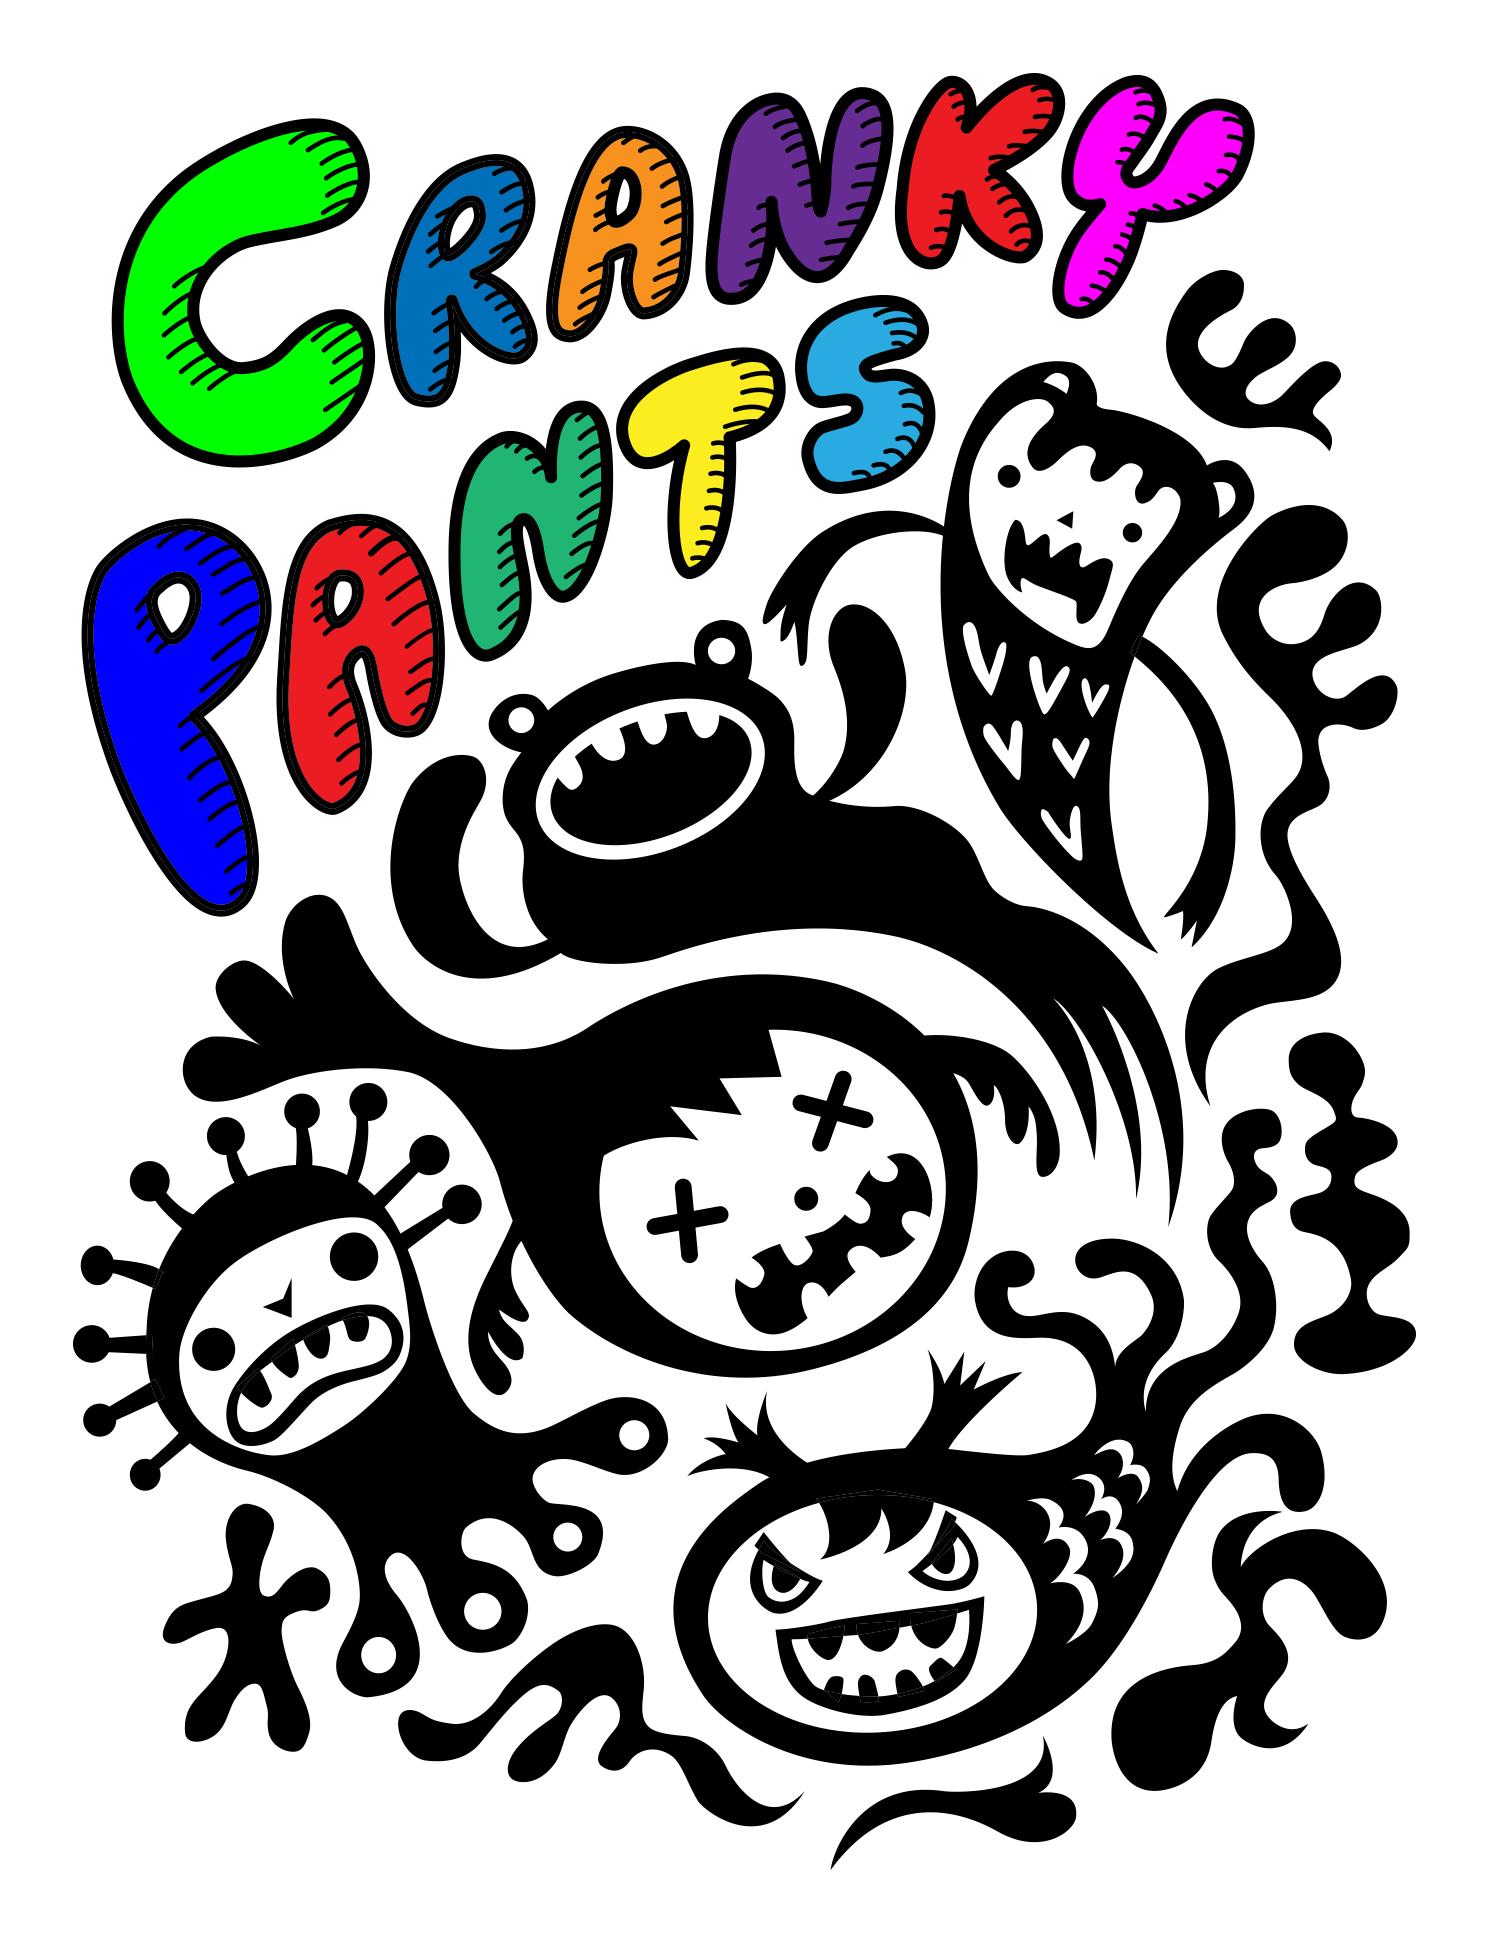 cranky_pants_type_andi_bird.png